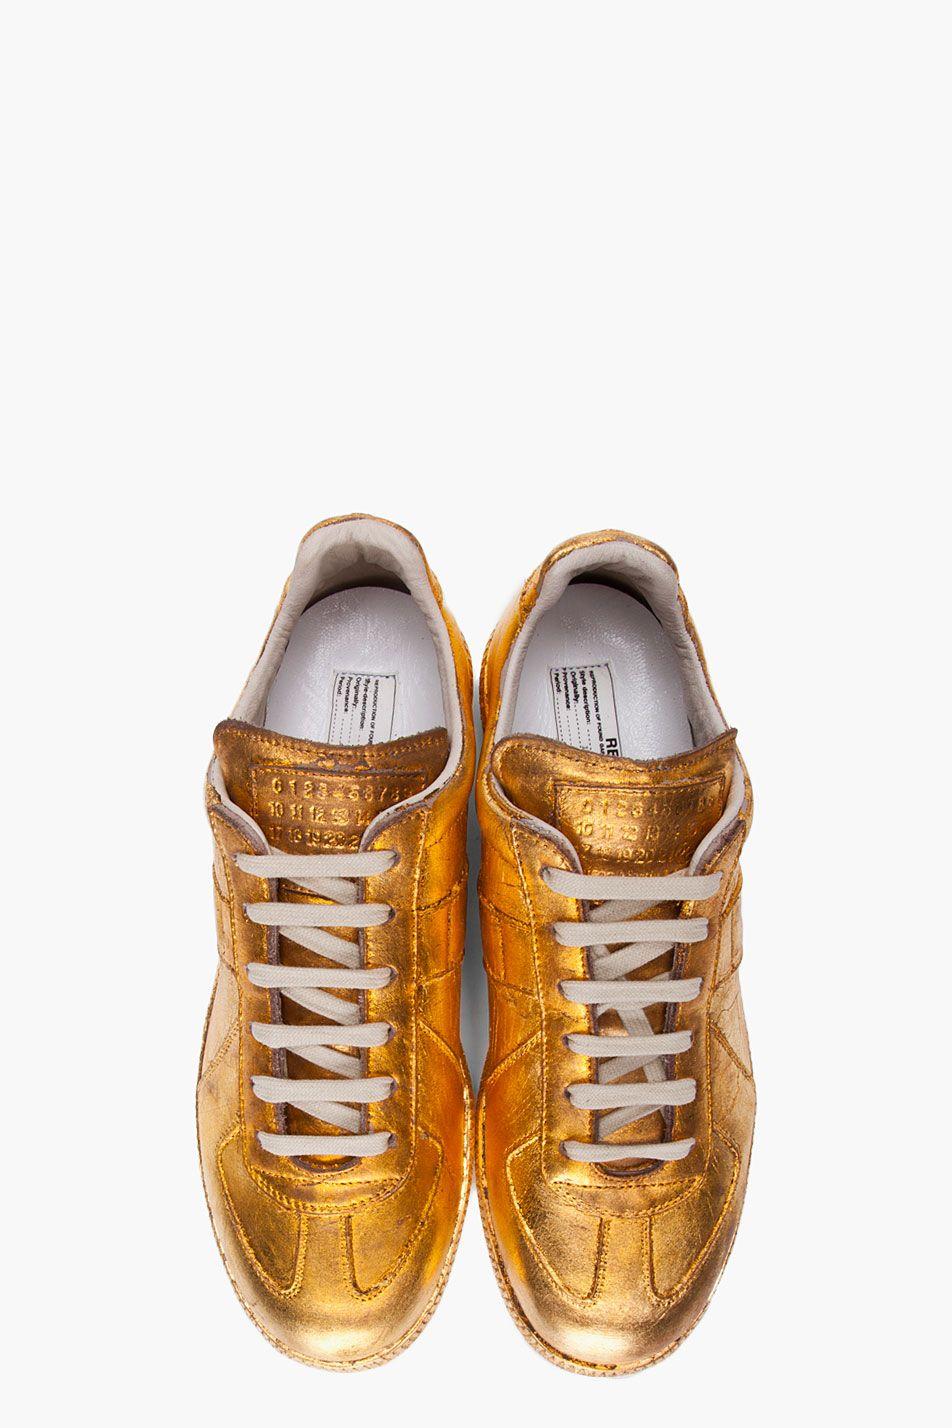 Everything Sneakers Gold Margiela These Metallic Martin Maison Are ARLjq354